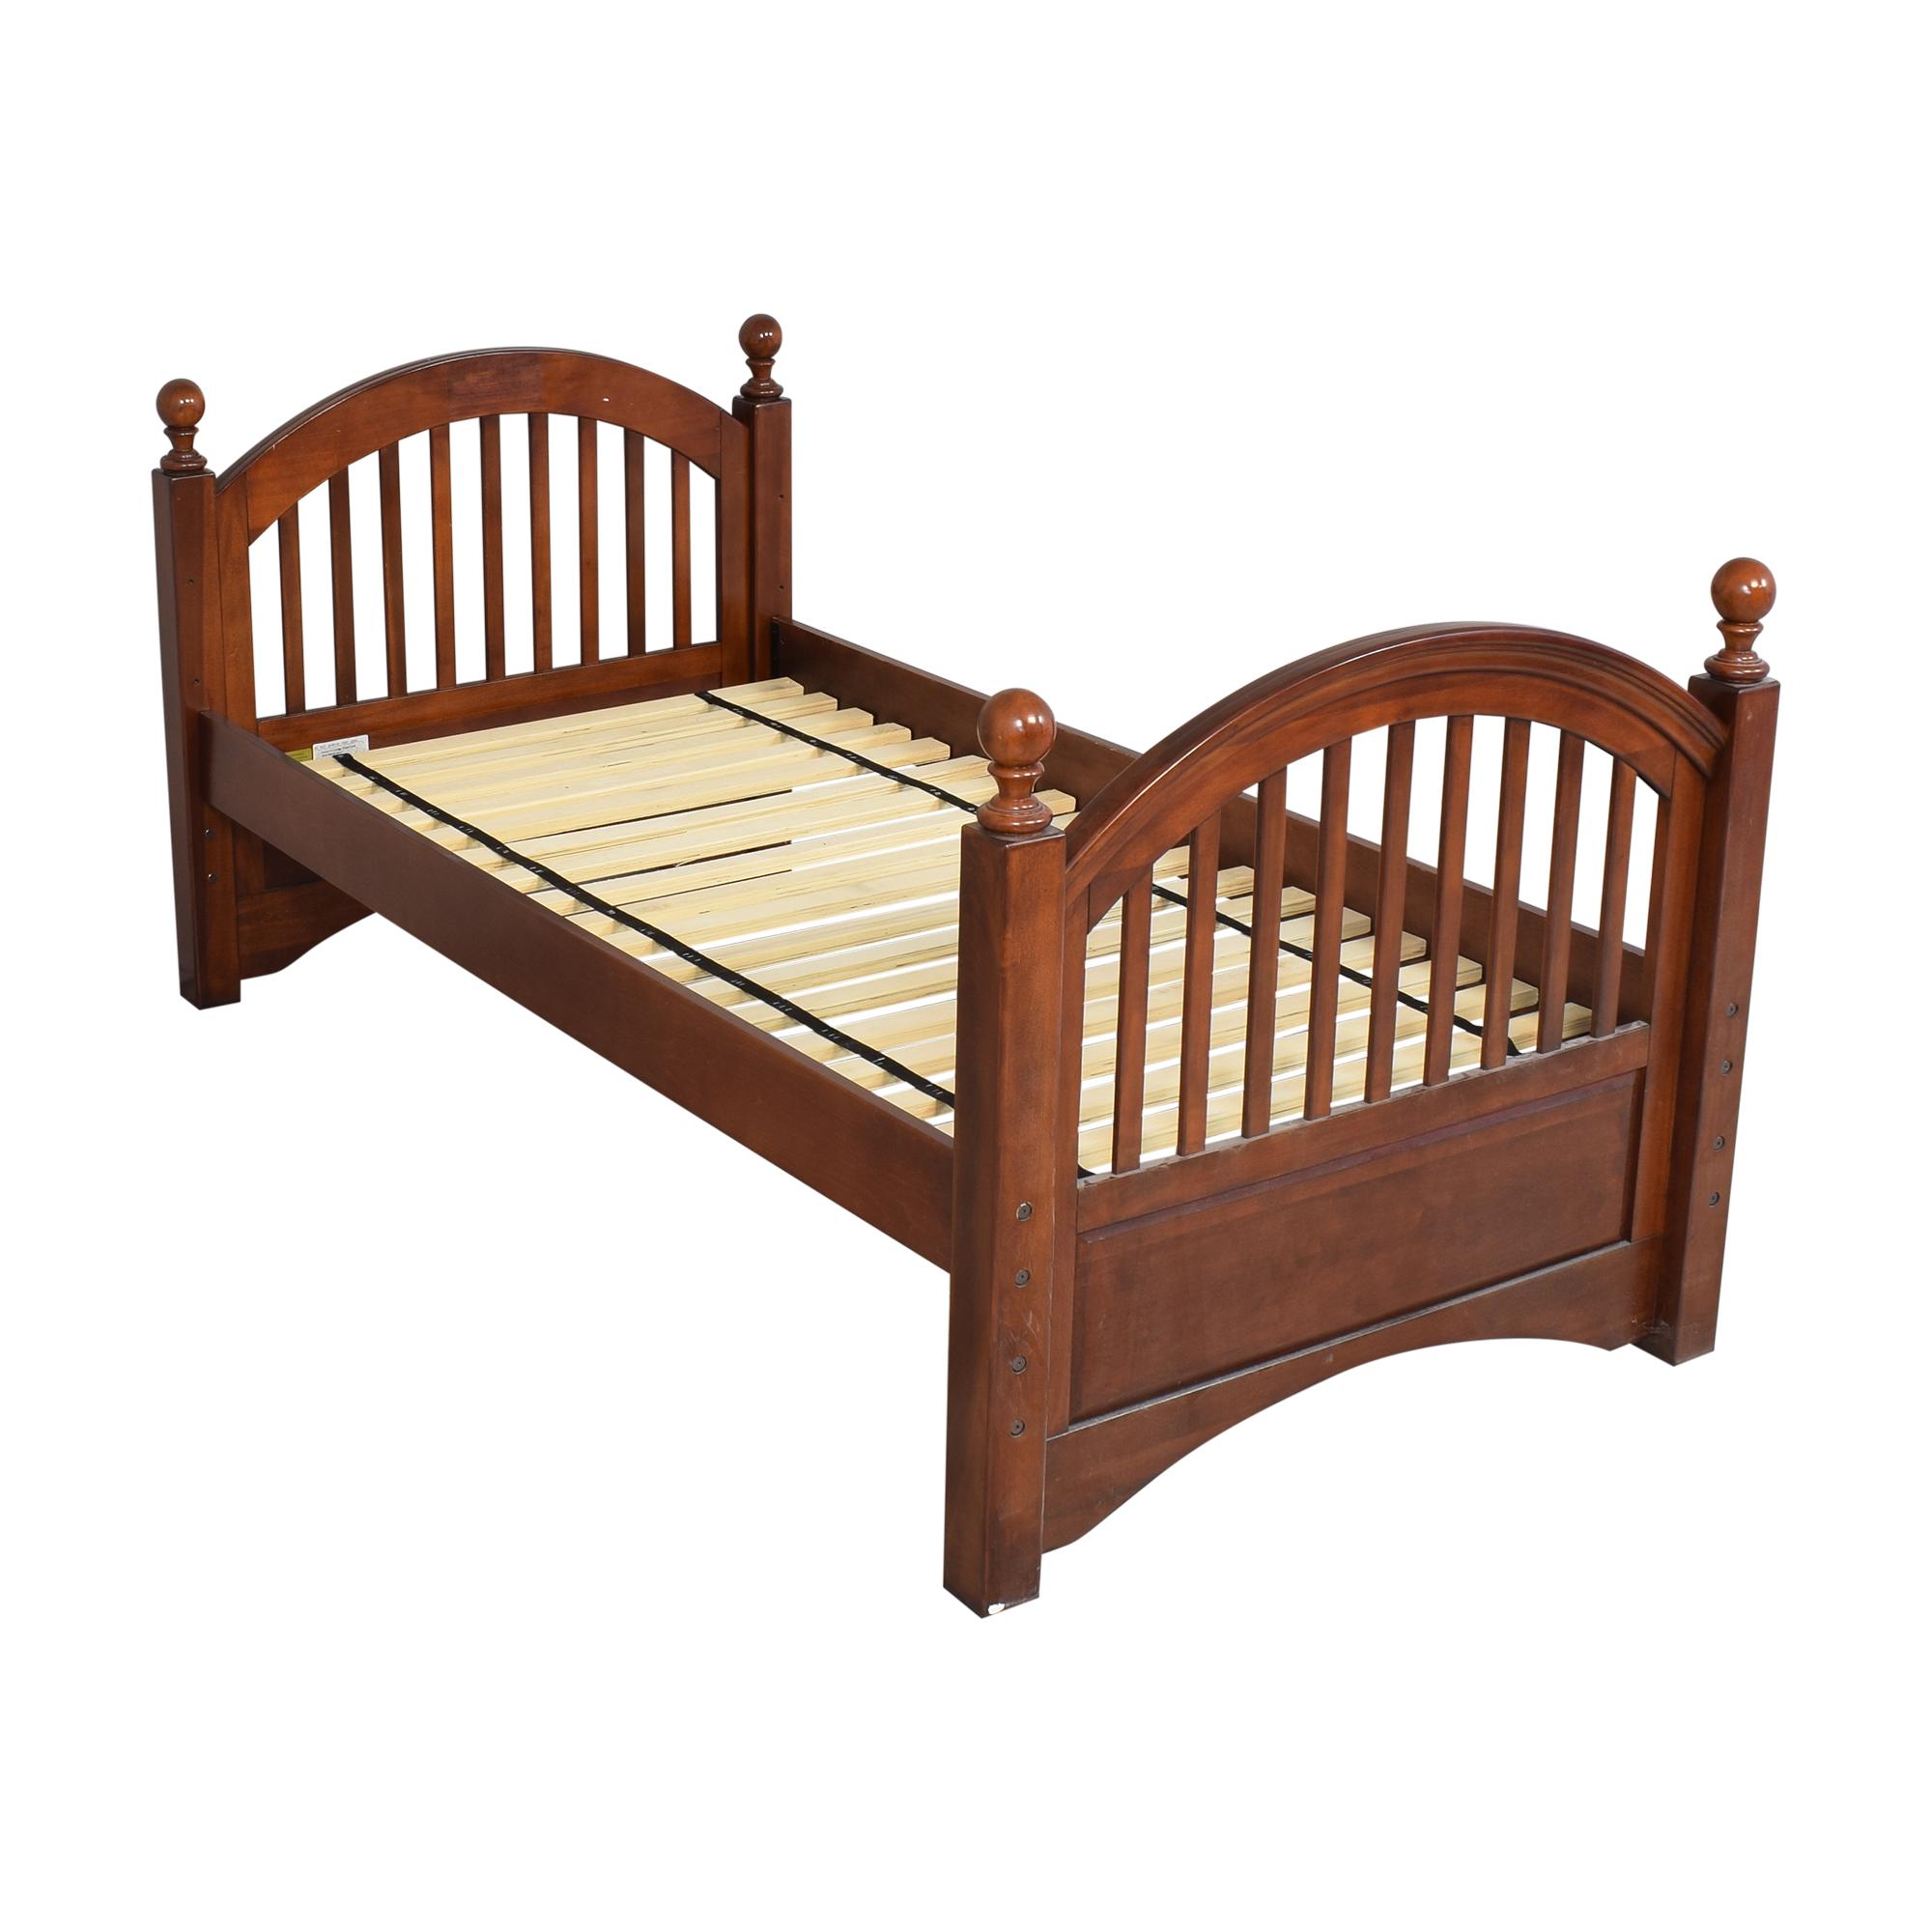 Legacy Classic Furniture Legacy Classic Slat Twin Bed discount